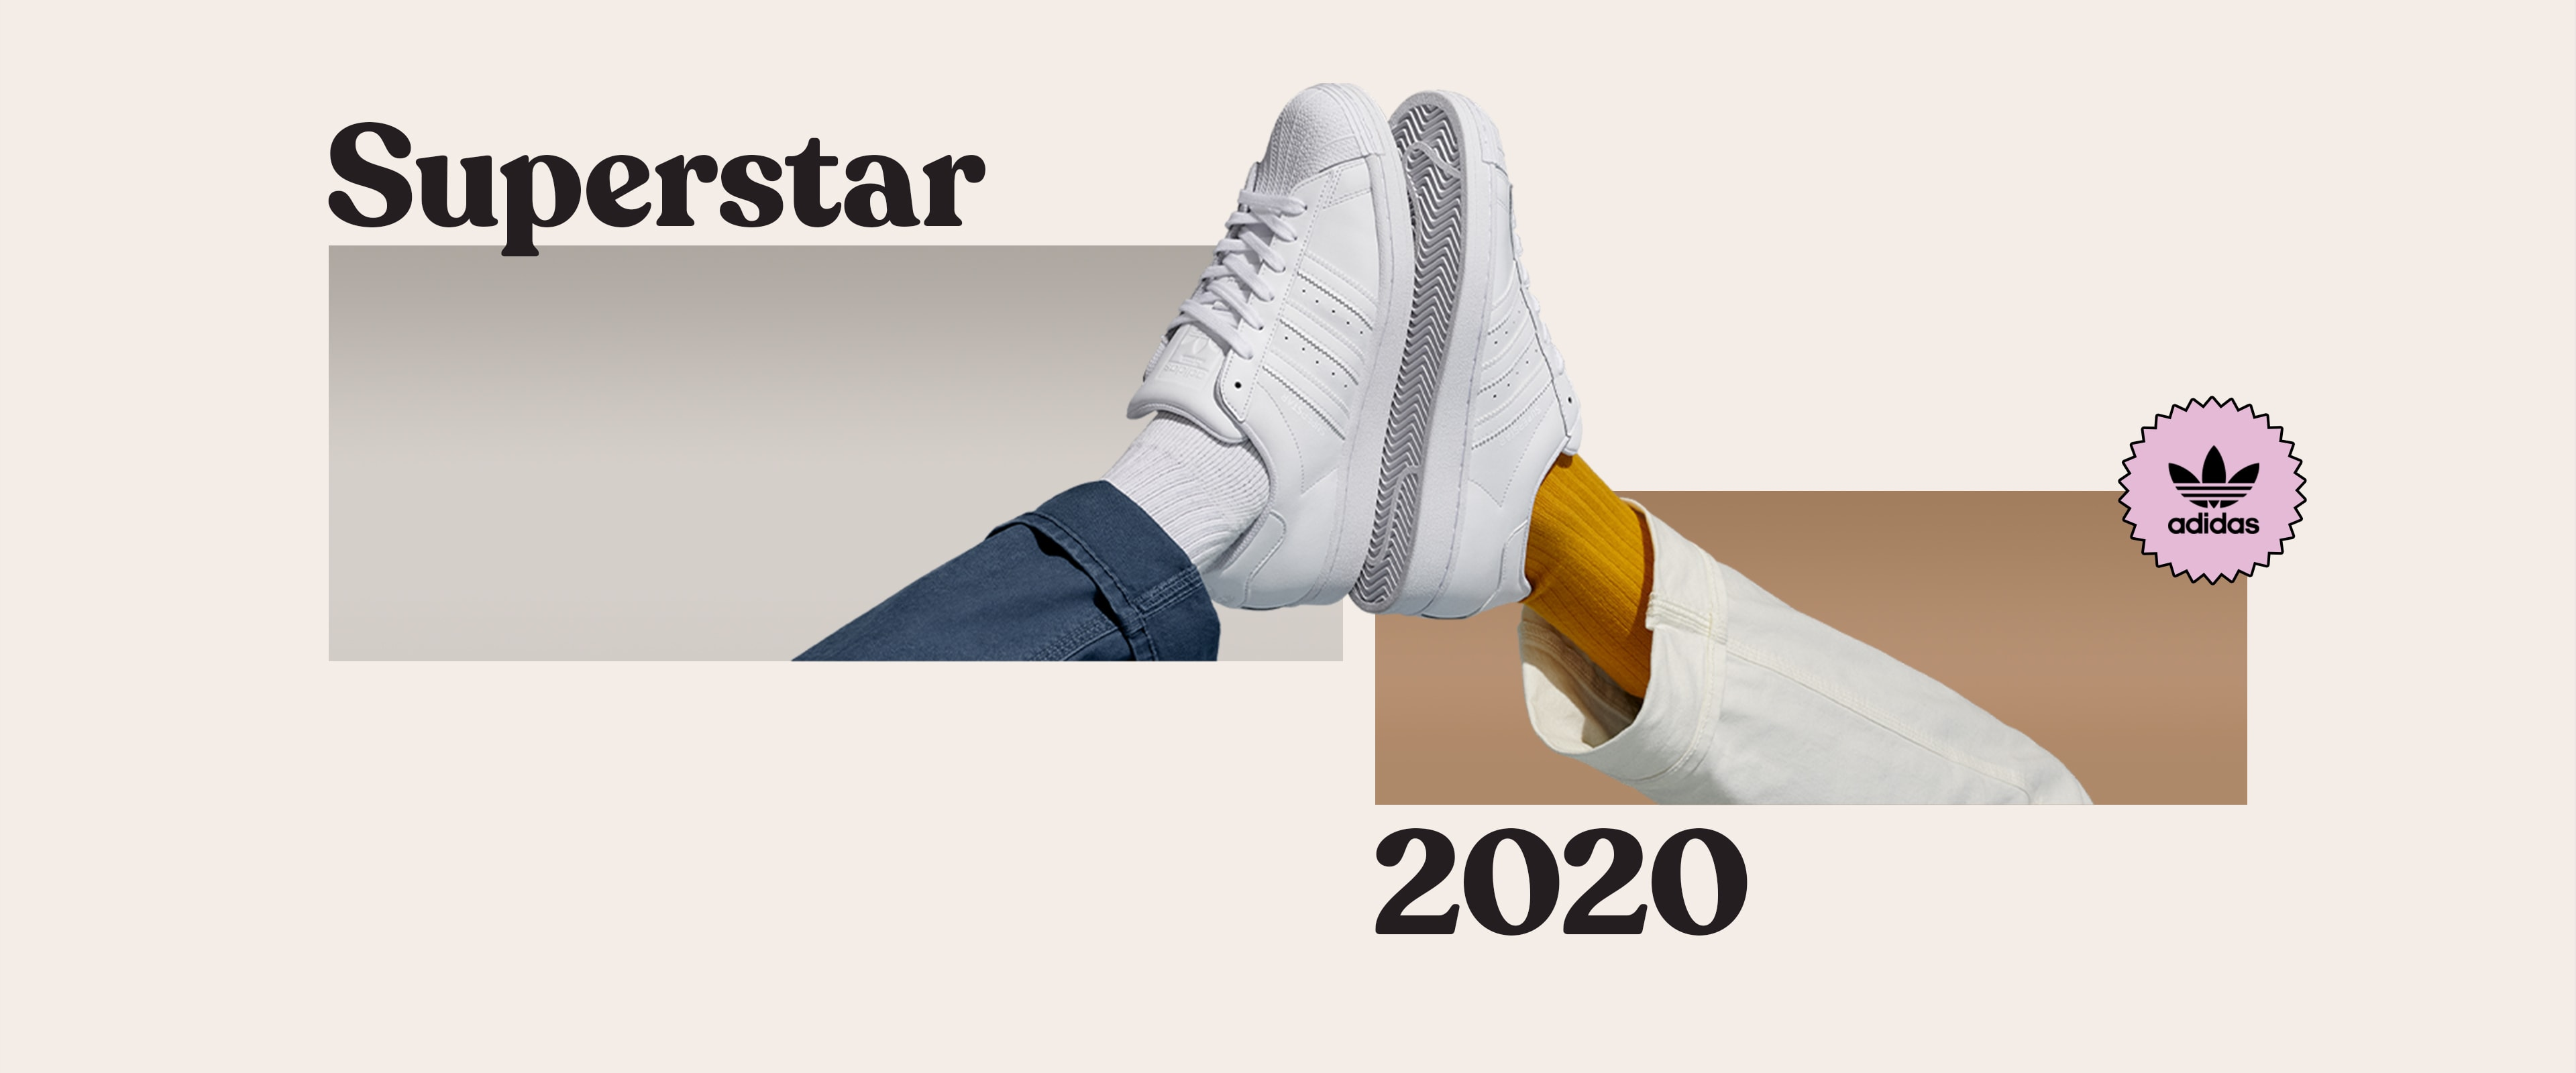 SUPERSTAR 2020 | adidas NO